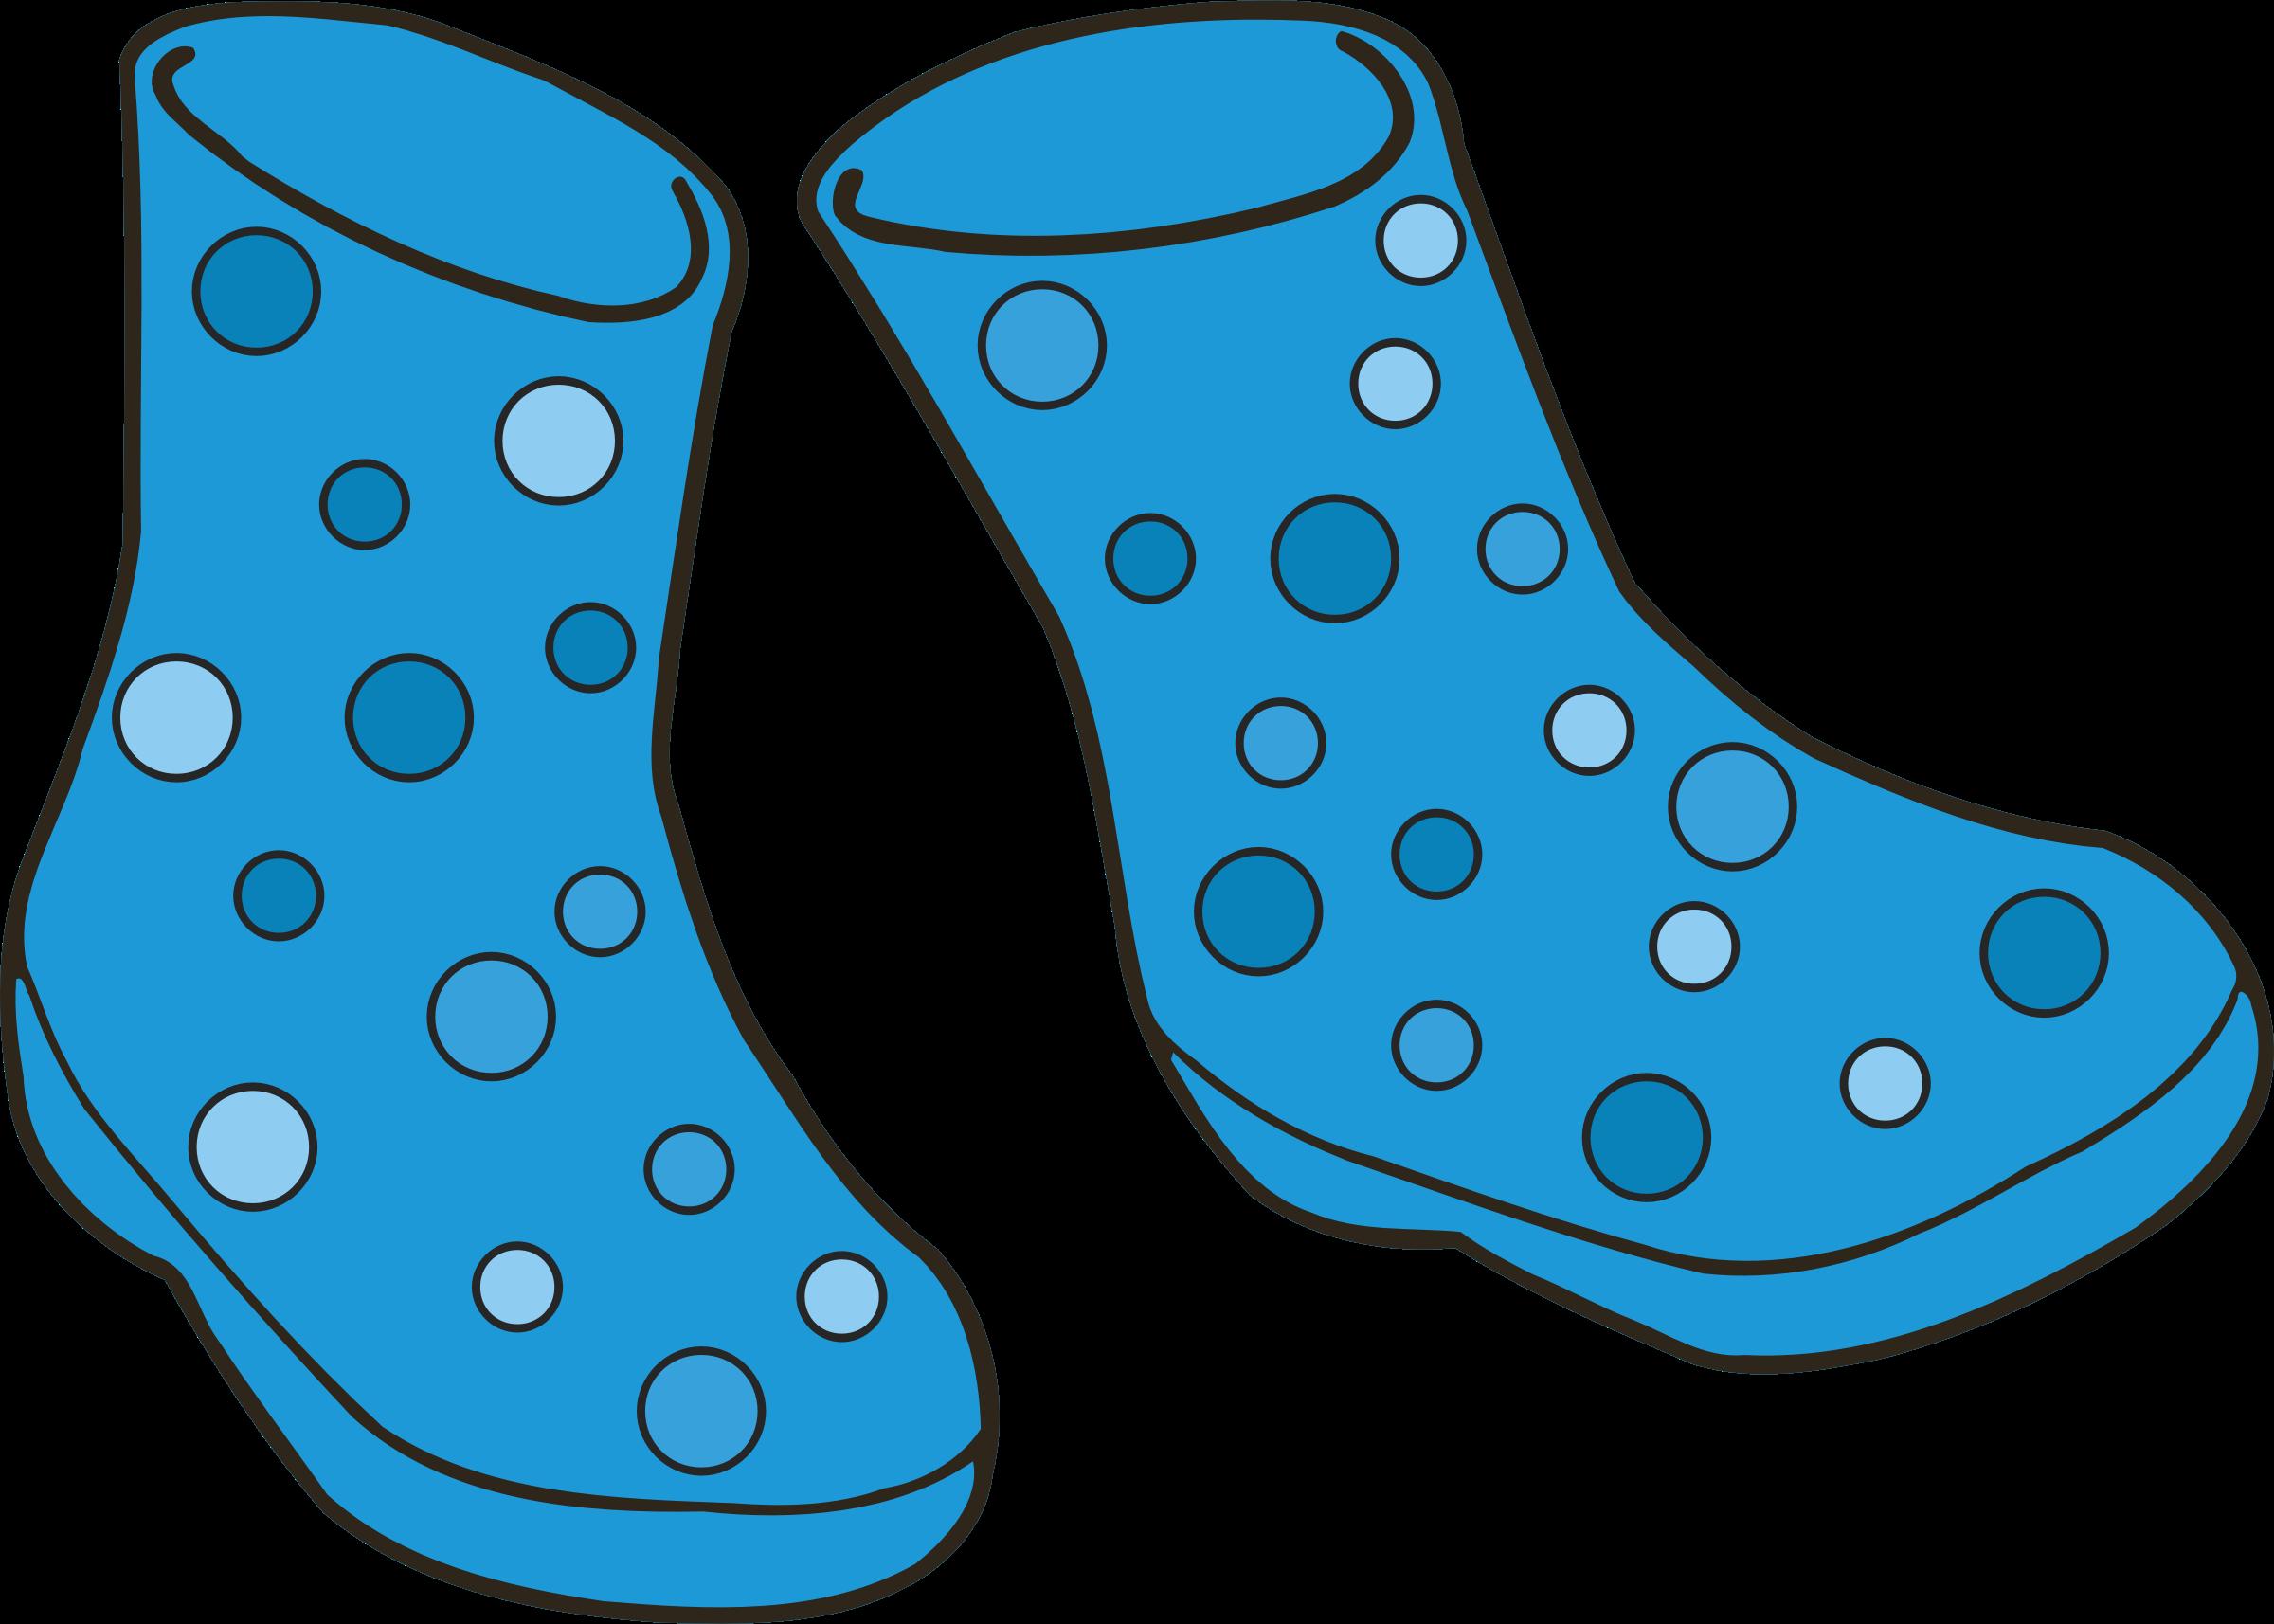 Transparent boot clipart - Clipart - Free Clip Art Rain Boots